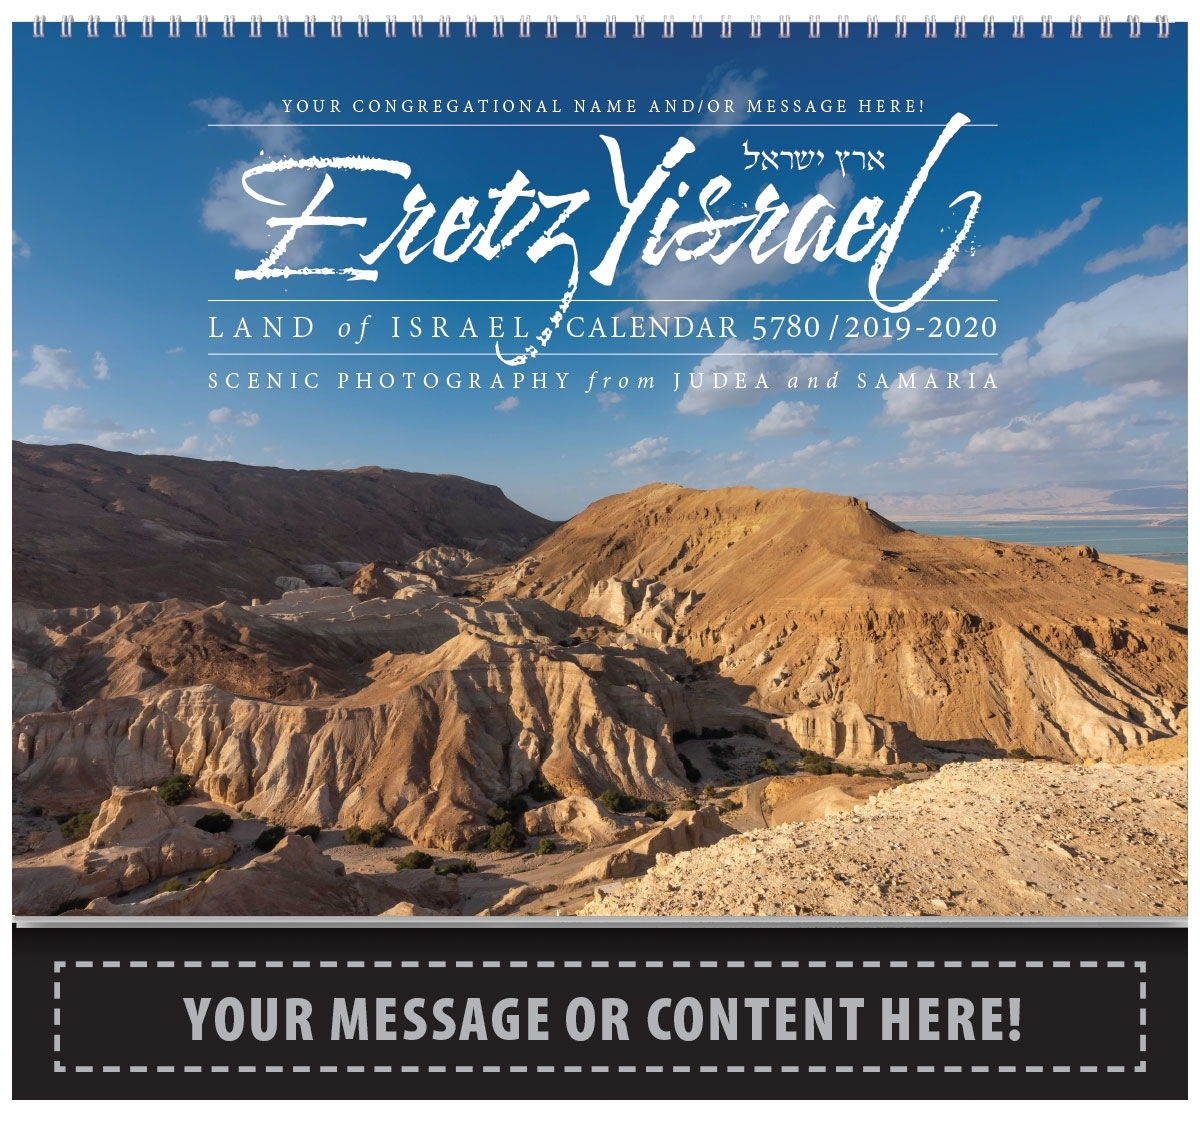 Custom Eretz Yisrael / Land Of Israel Calendar with regard to 2019 - 2020 Weekly Torah Portion Calendar